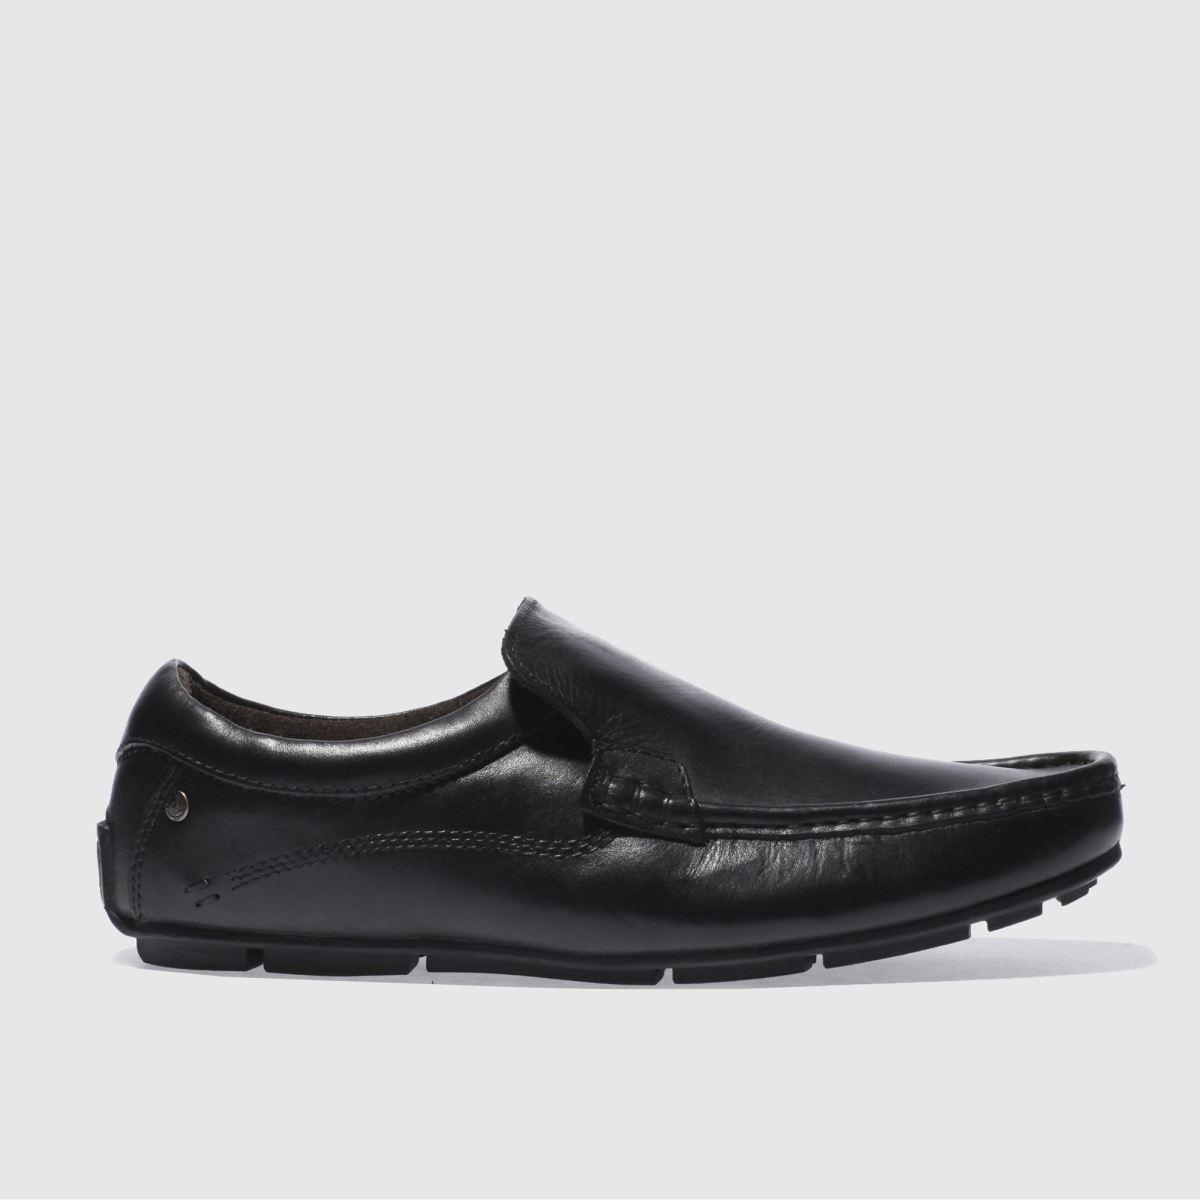 base london black britain loafer shoes